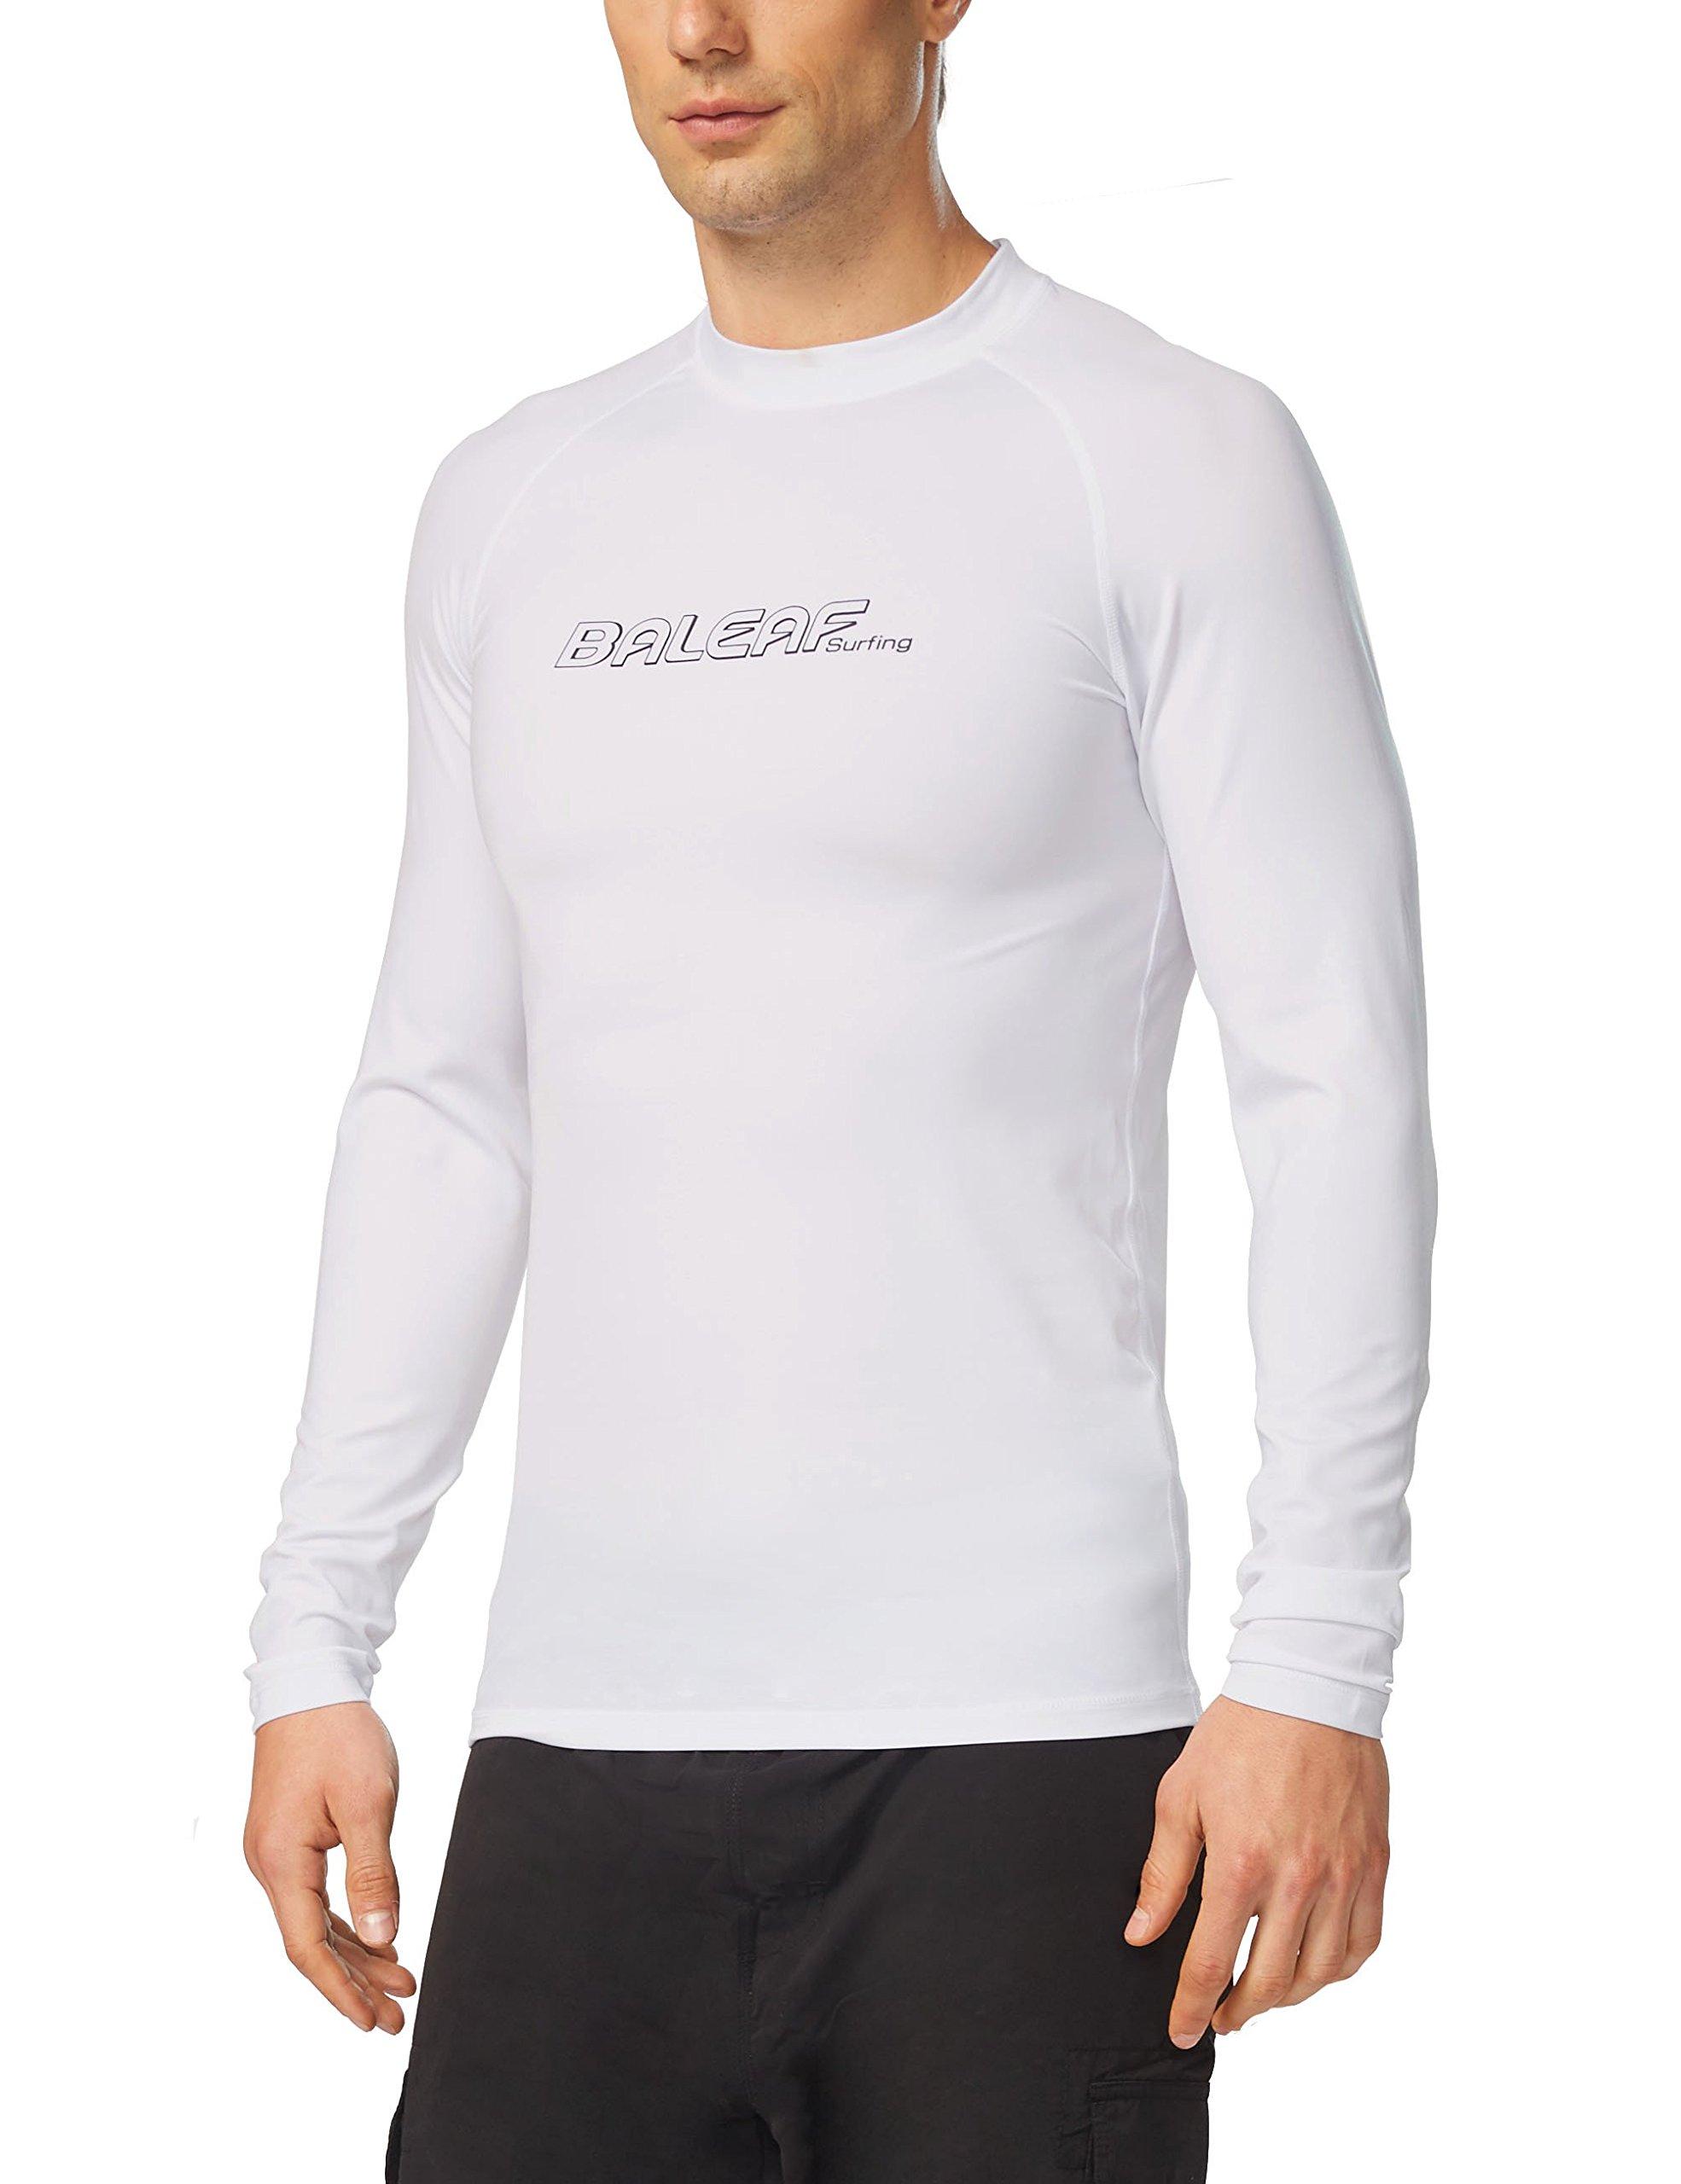 Baleaf Men's Long Sleeve Rashguard Sun Protective Swim Shirt UPF 50+ White Size L by Baleaf